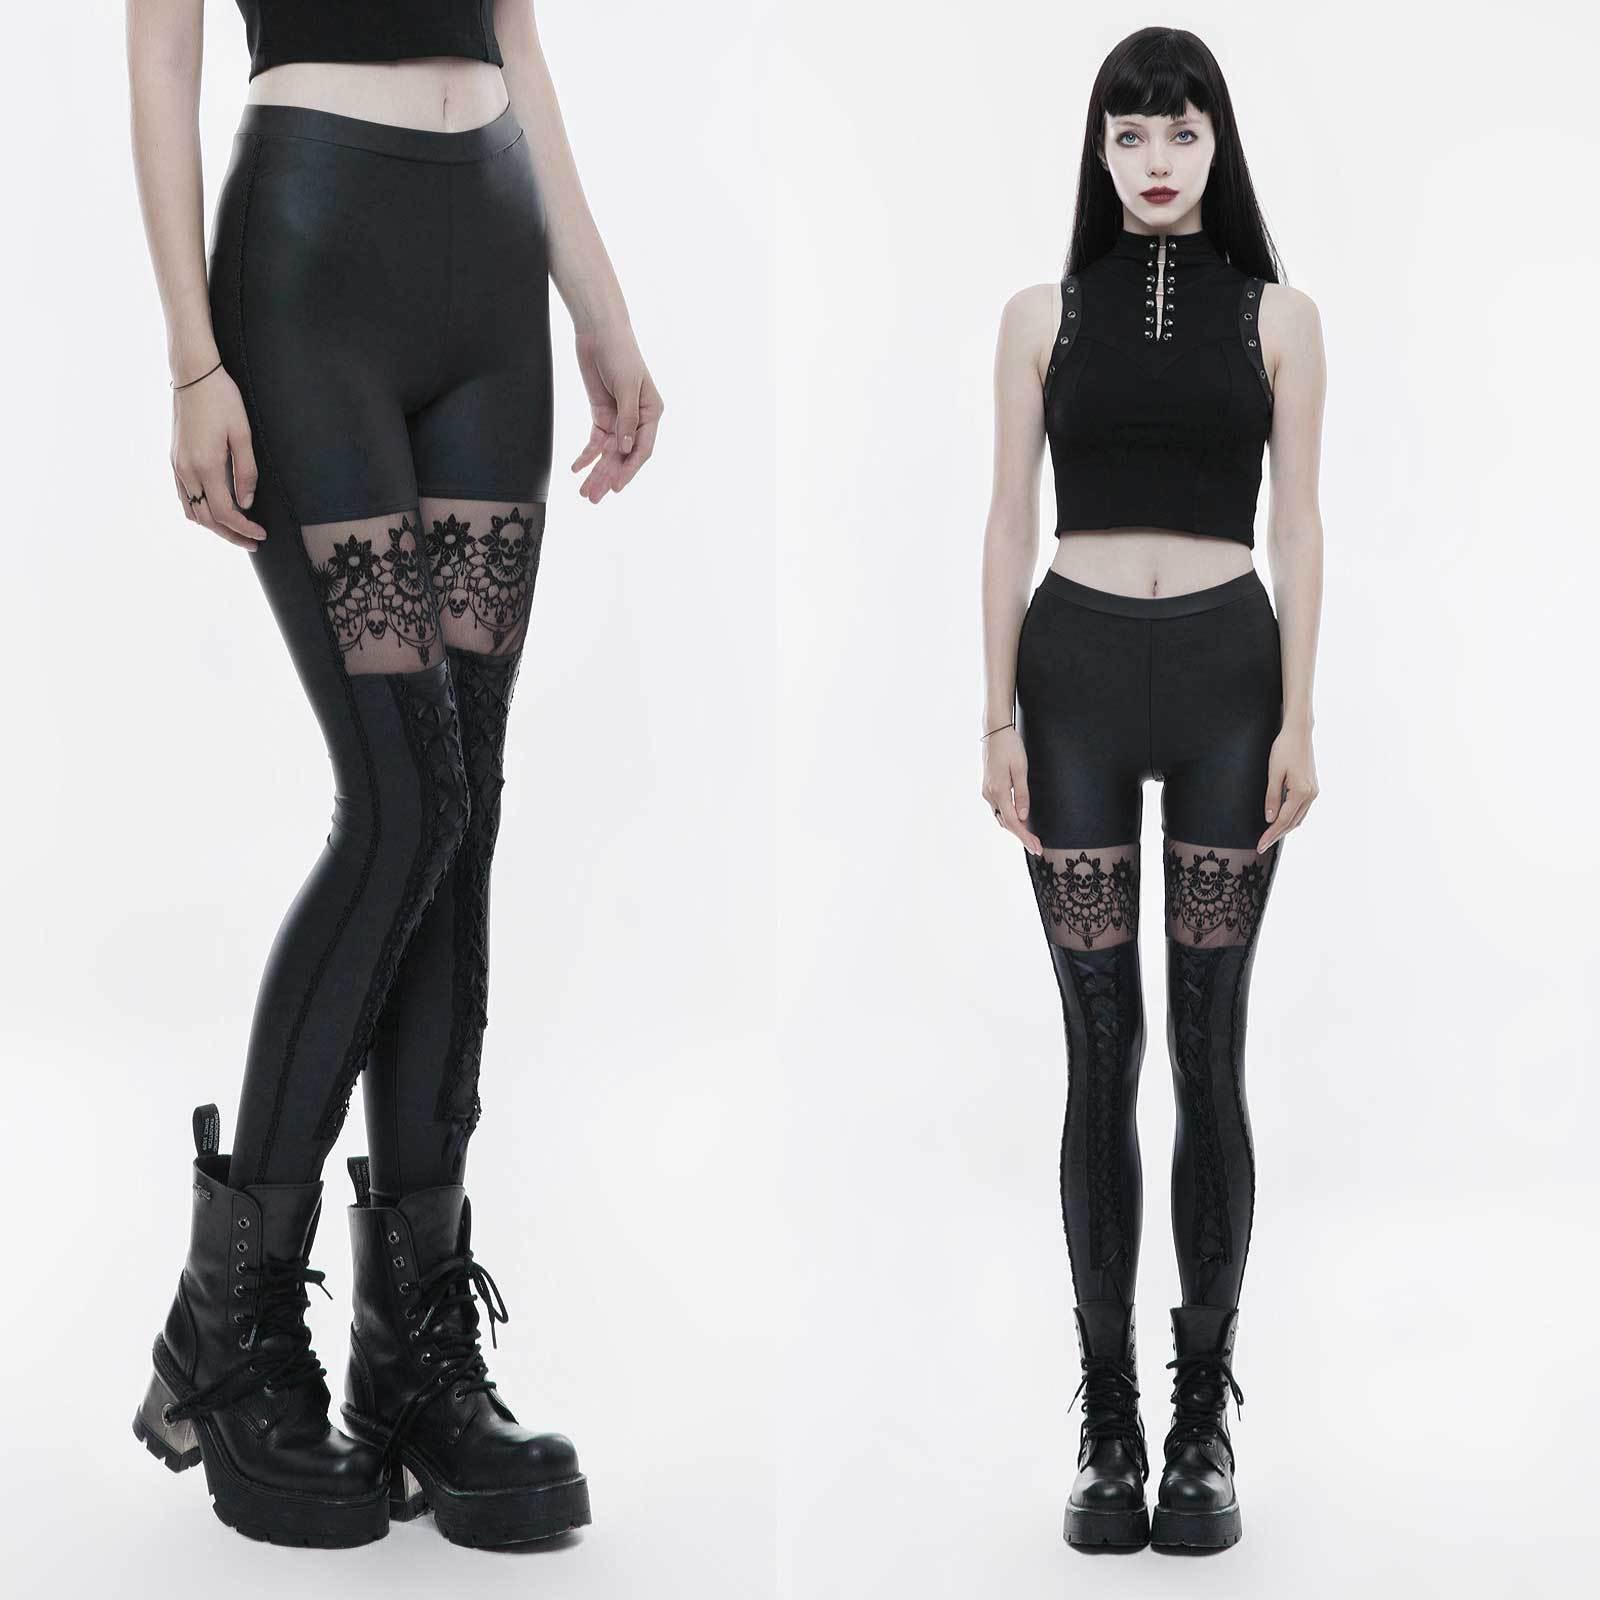 Punk Rave DEAD SKULL Leggings Gothic Legging con Pizzo gommosa superficie